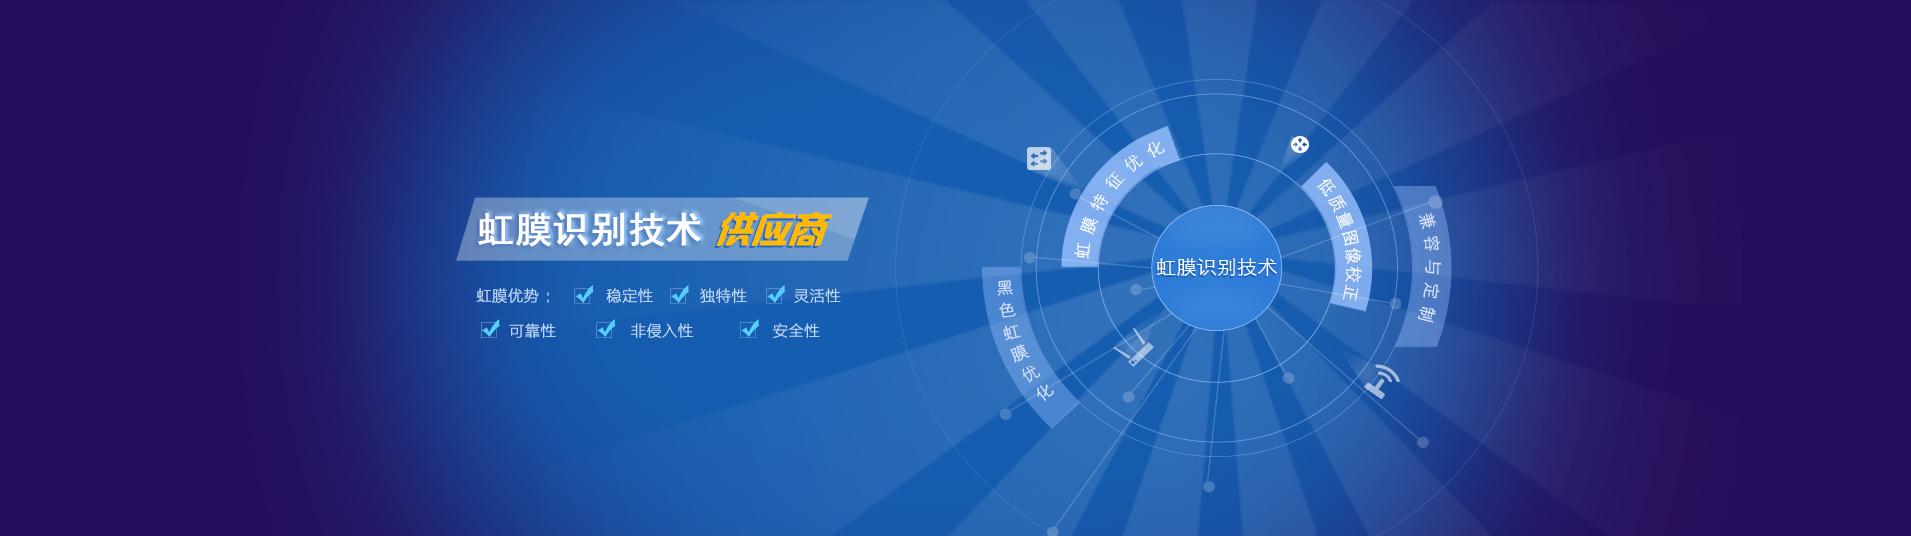 banner-虹膜識別技術供應商